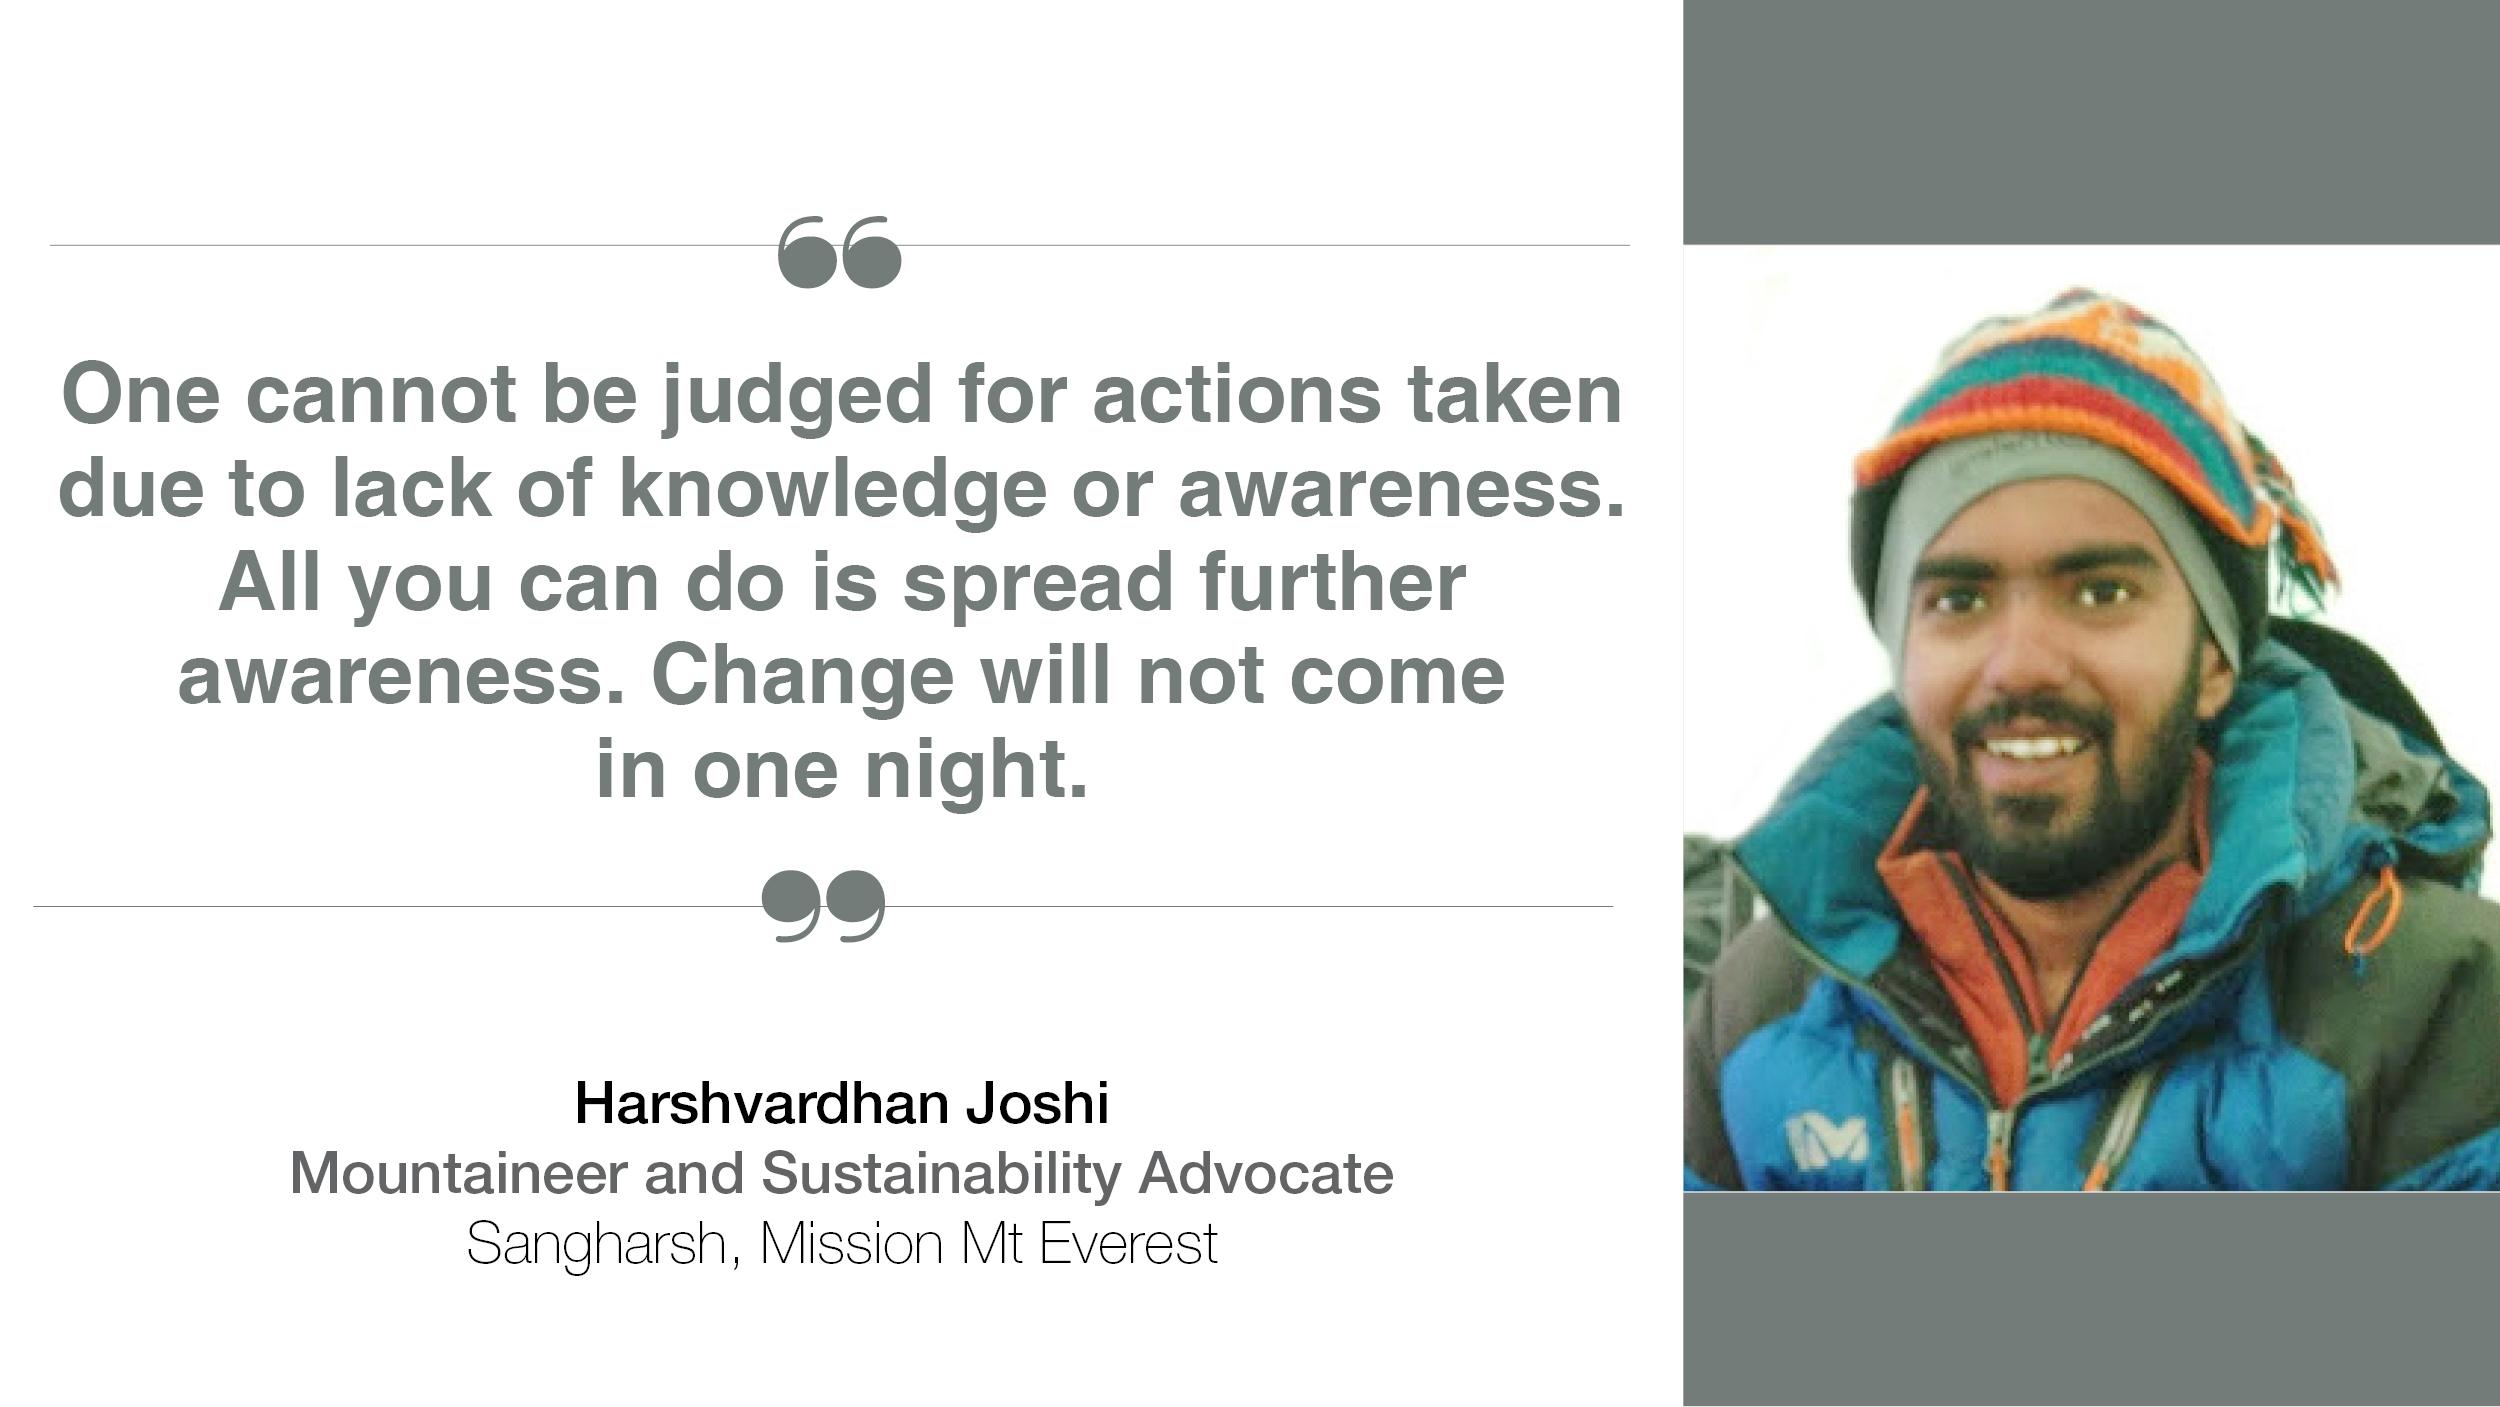 Harshvardhan Joshi